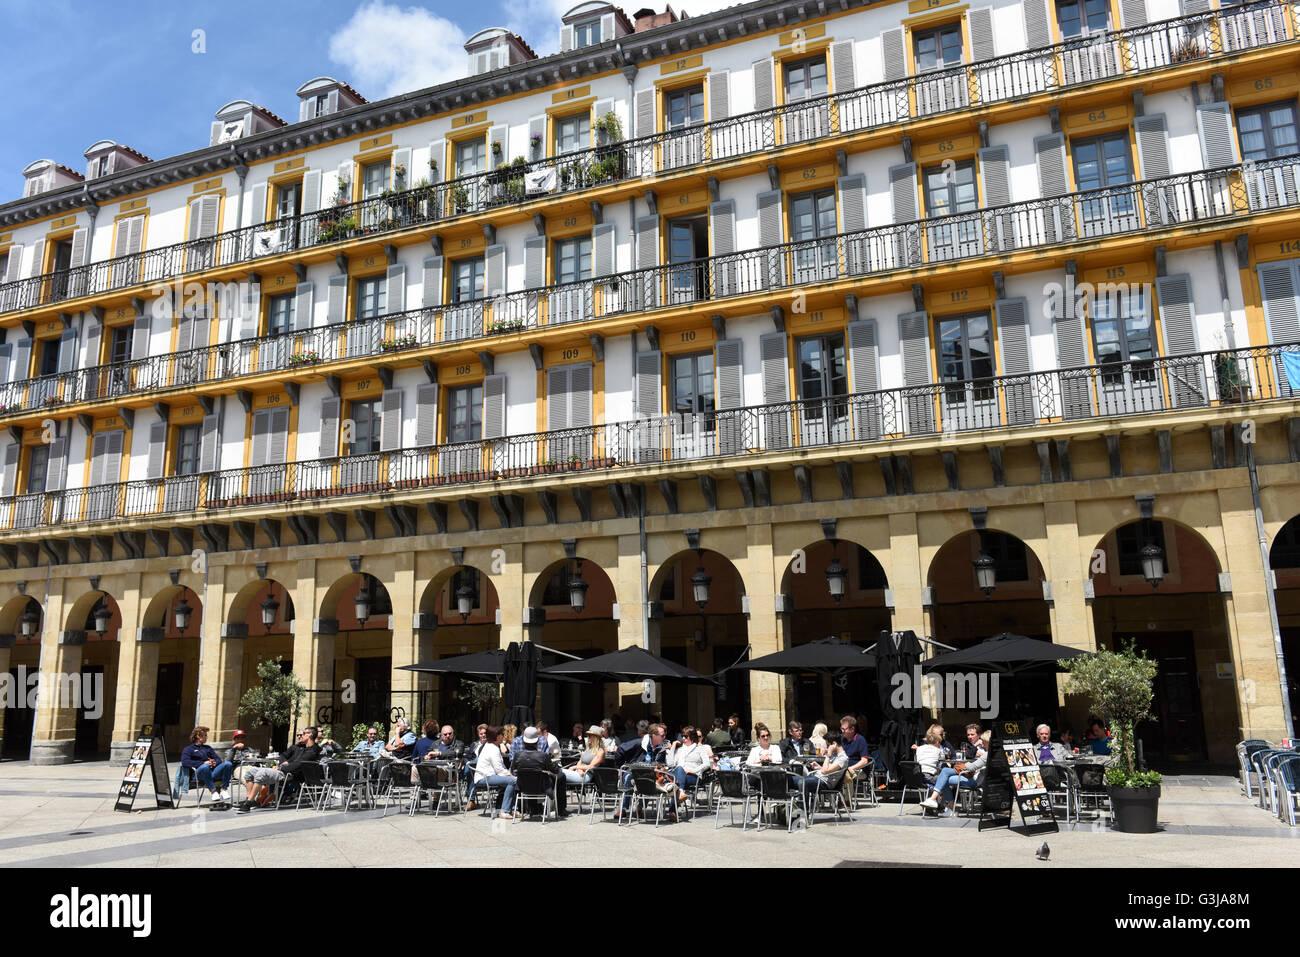 Constitution Square Plaza in San Sebastian or Donostia in Basque Country Spain - Stock Image